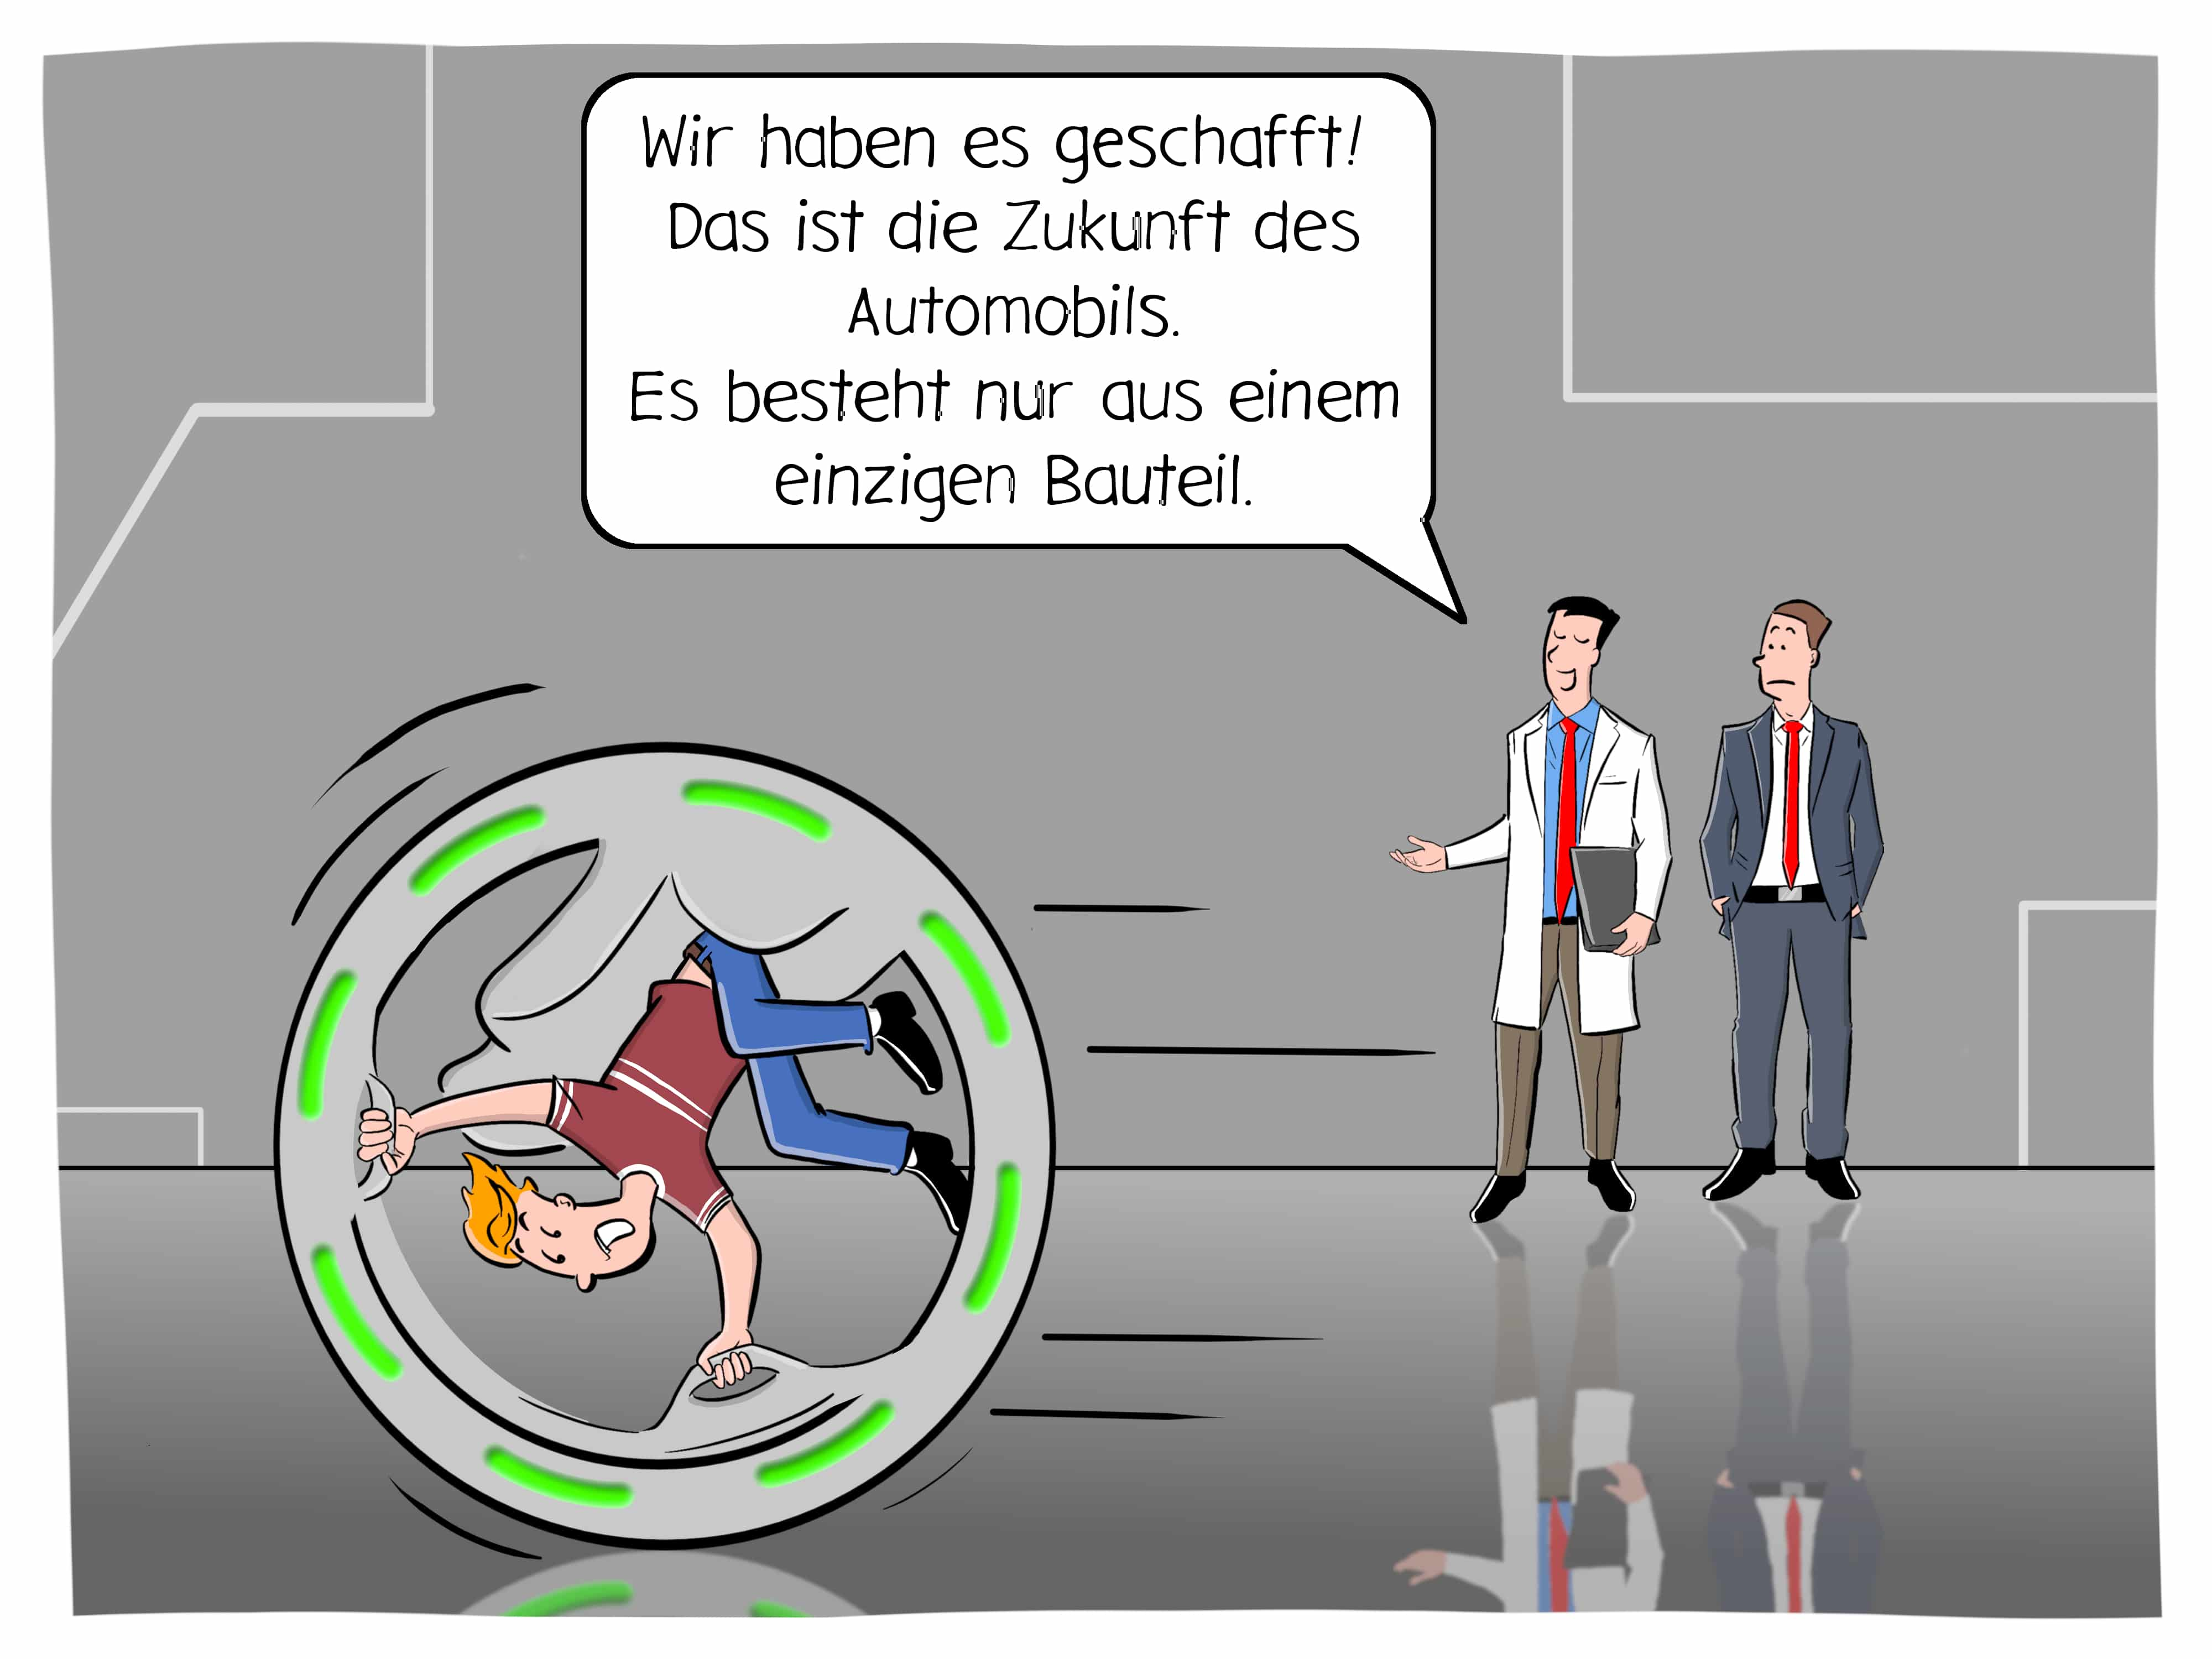 Automobilbranche Zukunft additive Fertigung Elektroantrieb EAuto Bauteile Cartoon